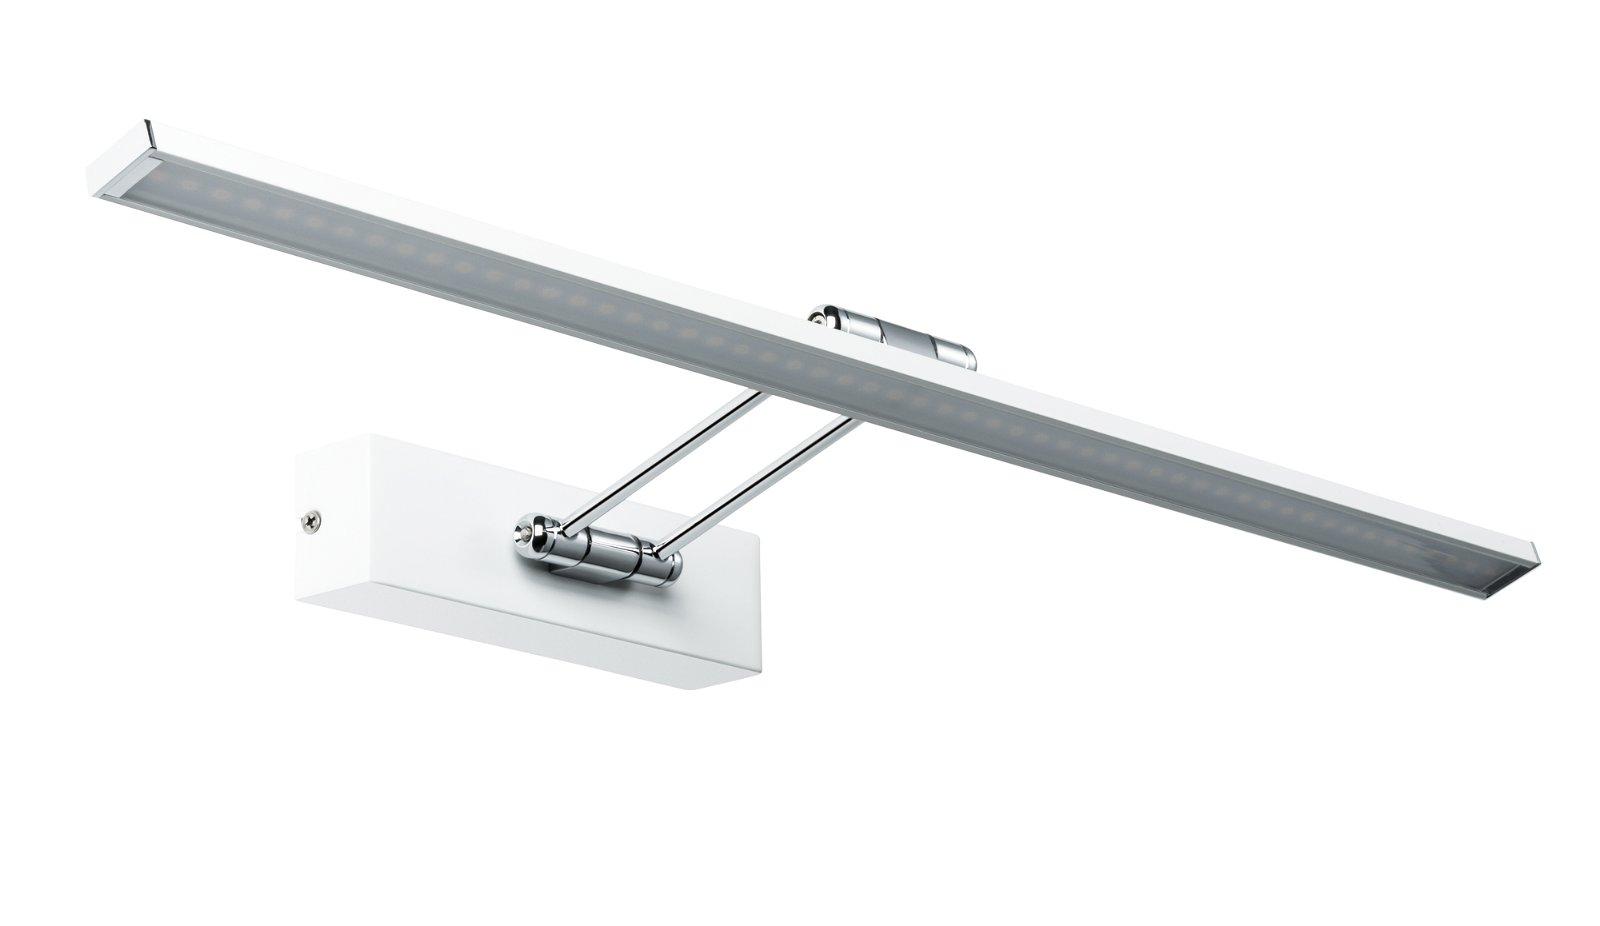 Galeria LED Bilderleuchte Beam 2700K 1250lm 230V 11W Weiß/Chrom